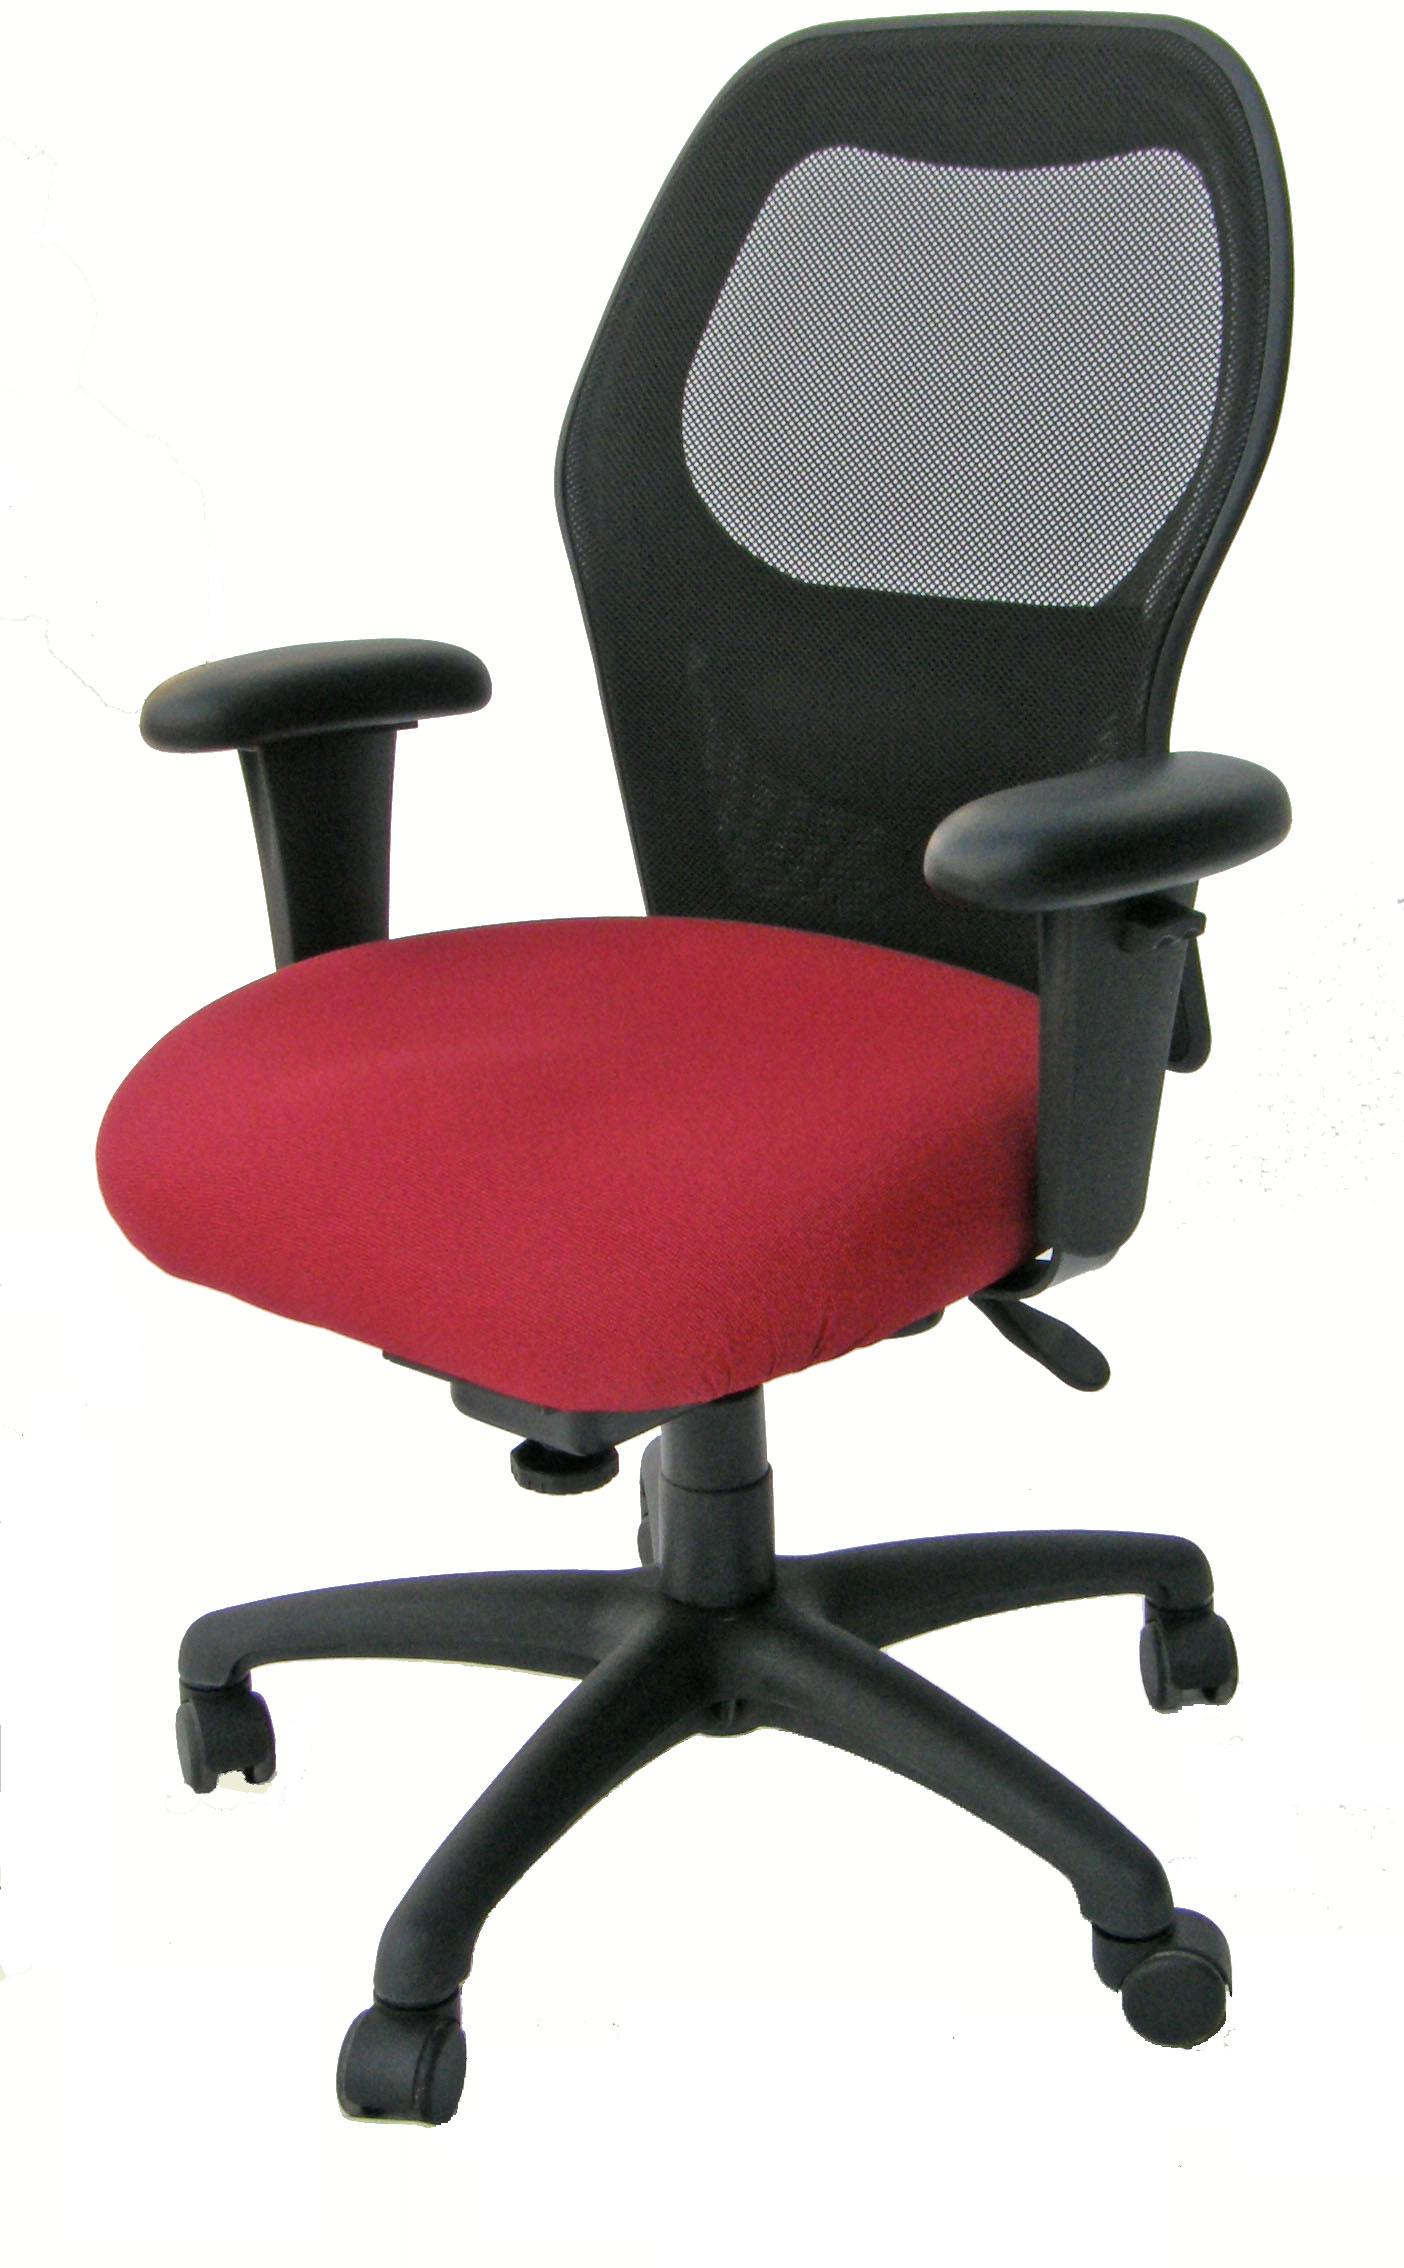 MVP Mesh Back Ergonomic Chair .... Fully Adjustable !! - Champion ... 754777b60f6f4